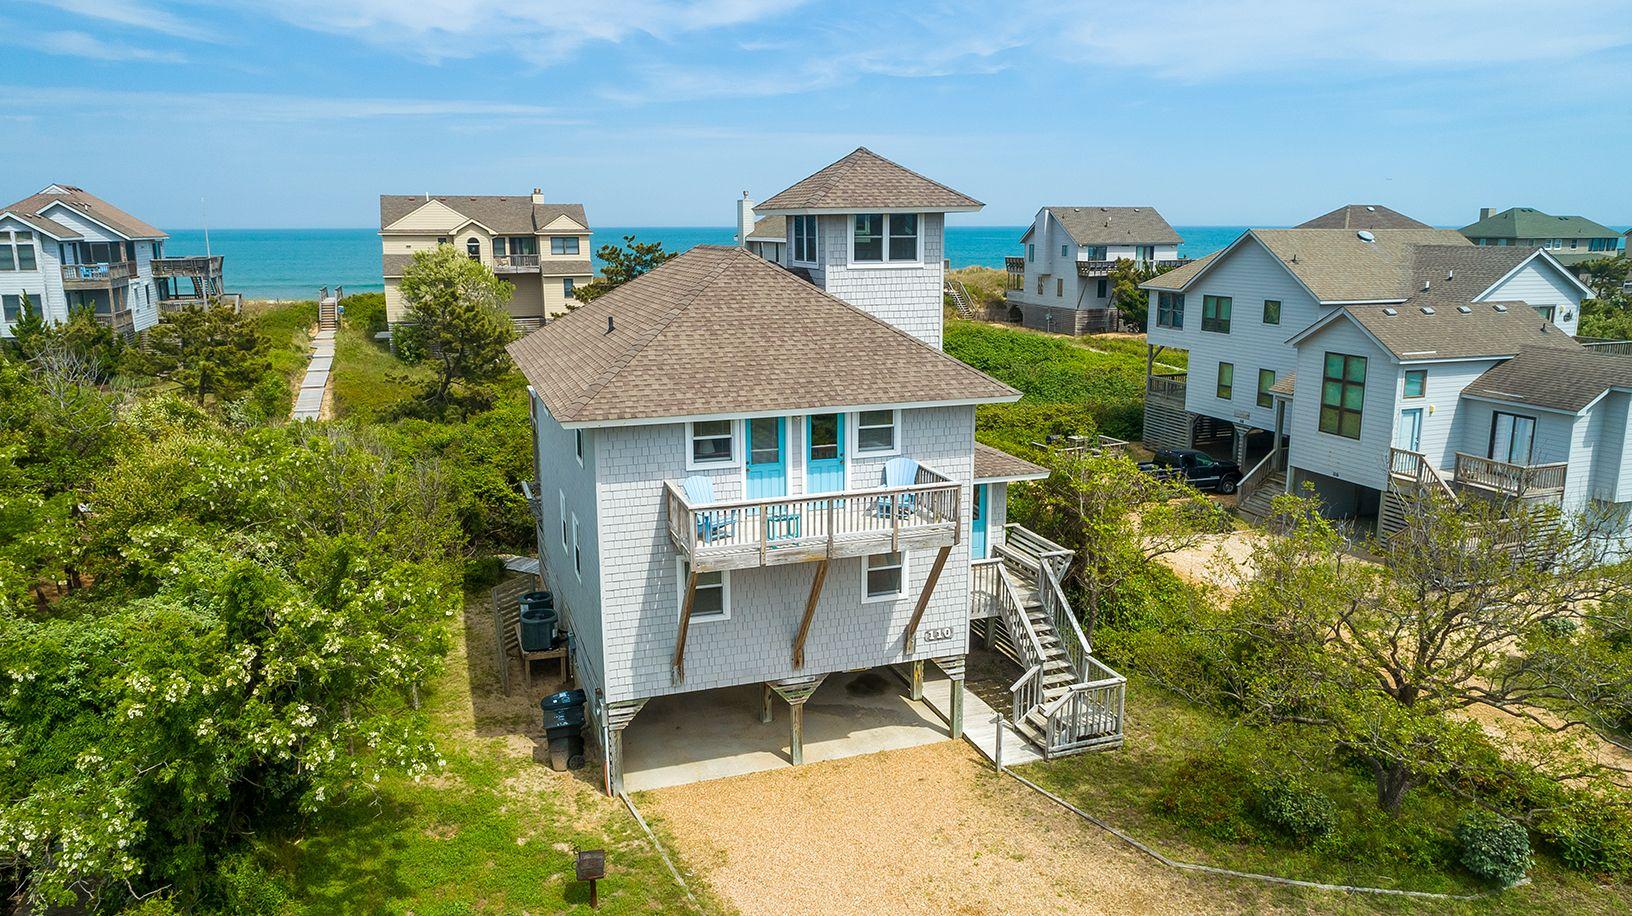 Hirsch Beach Haven In 2020 Oceanfront Vacation Rentals Beach Haven House Styles